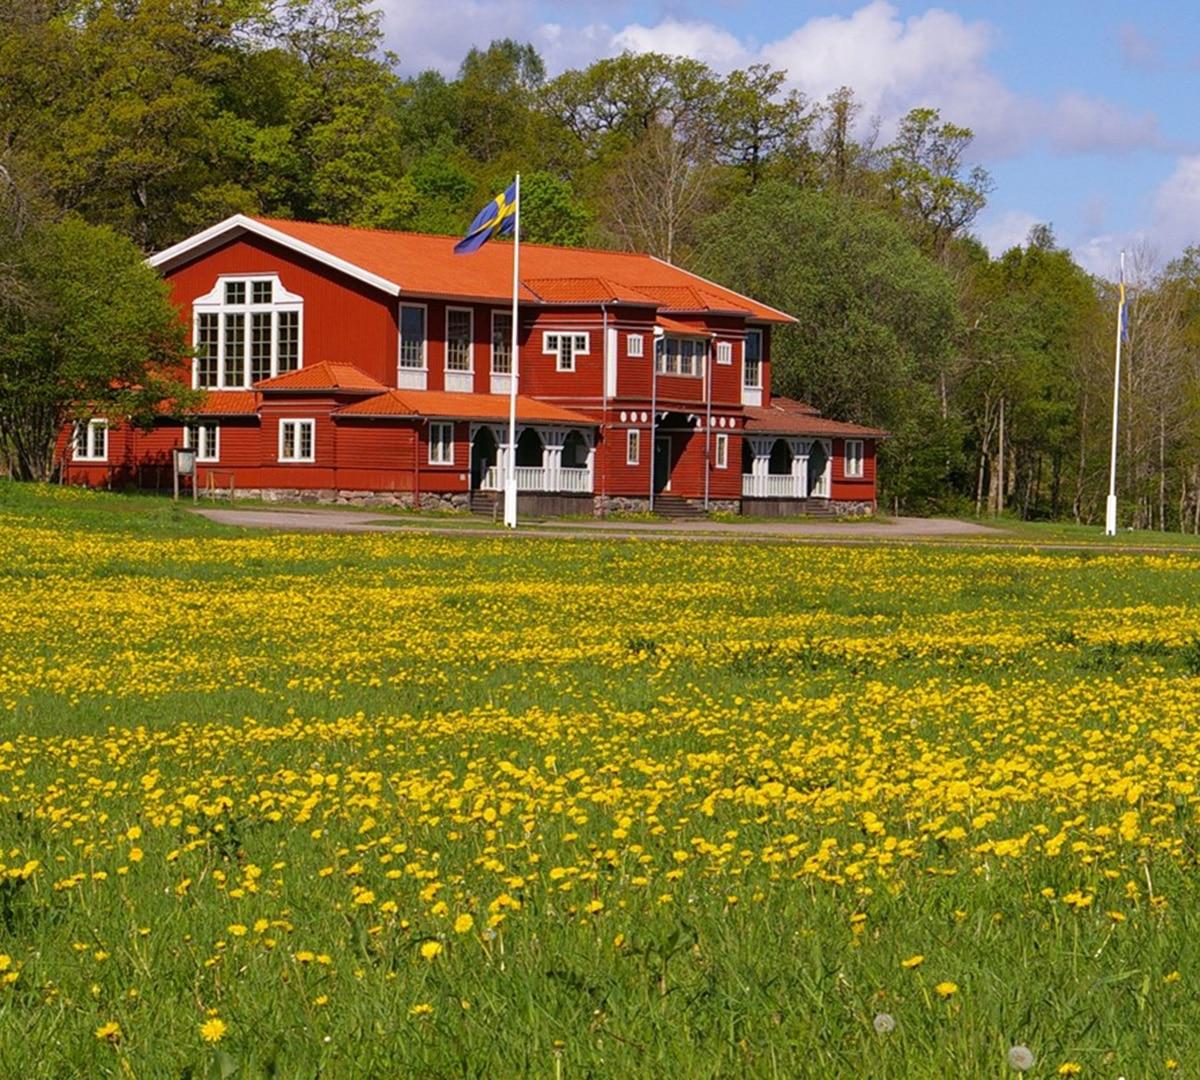 Nääs Slott, Lekhuset. Charmig festlokal för bröllop